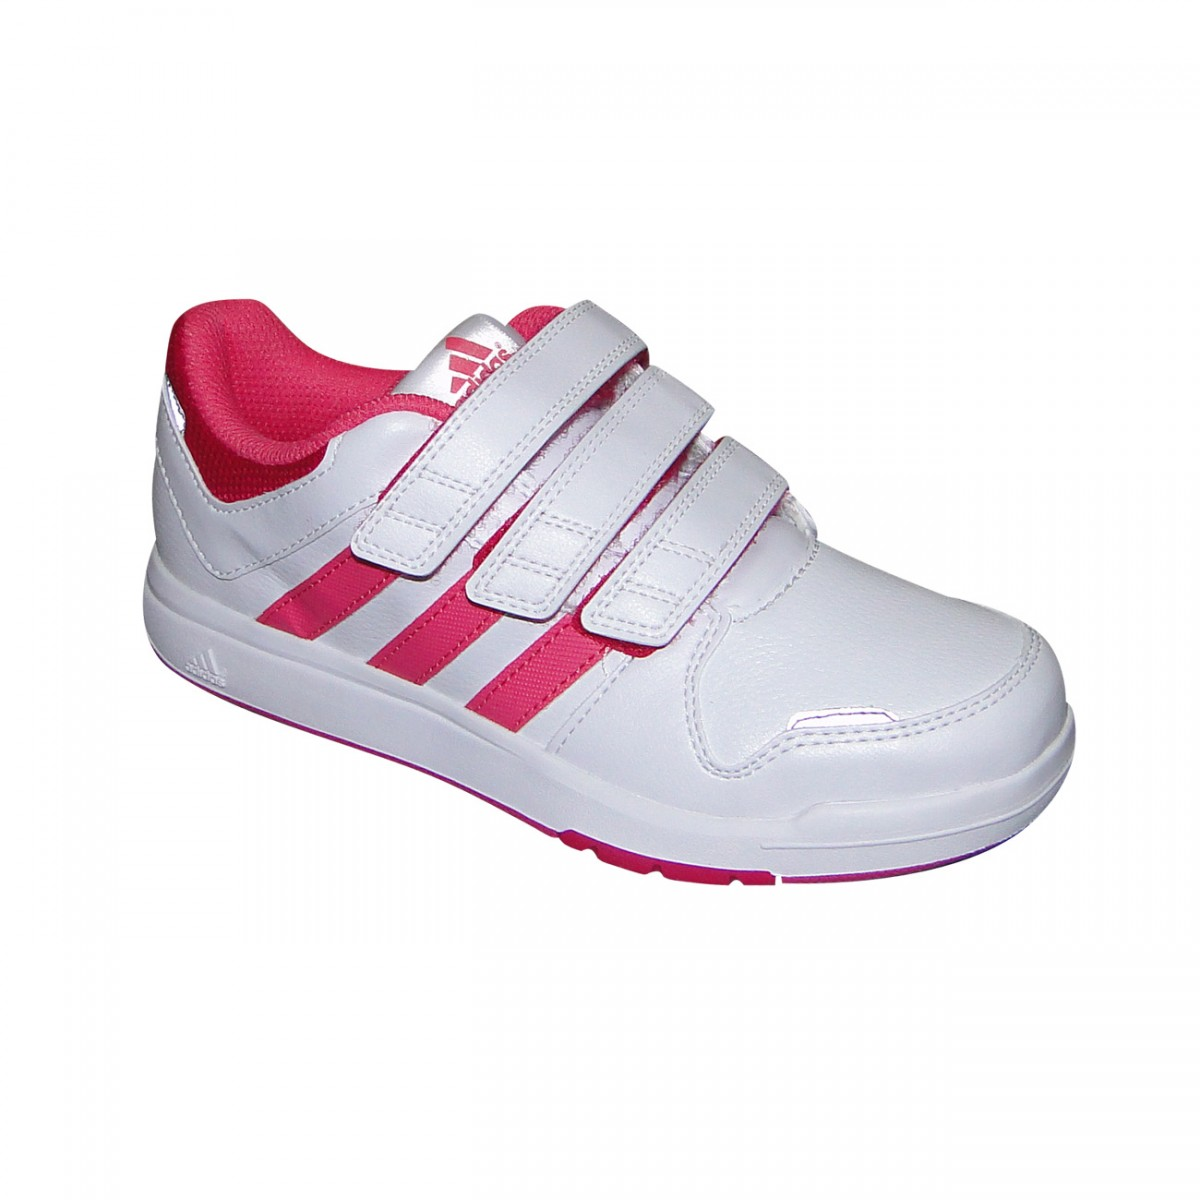 ef1664c9c54 Tenis Adidas Lk Trainer 6 Juvenil M20059 - Branco Pink - Chuteira ...